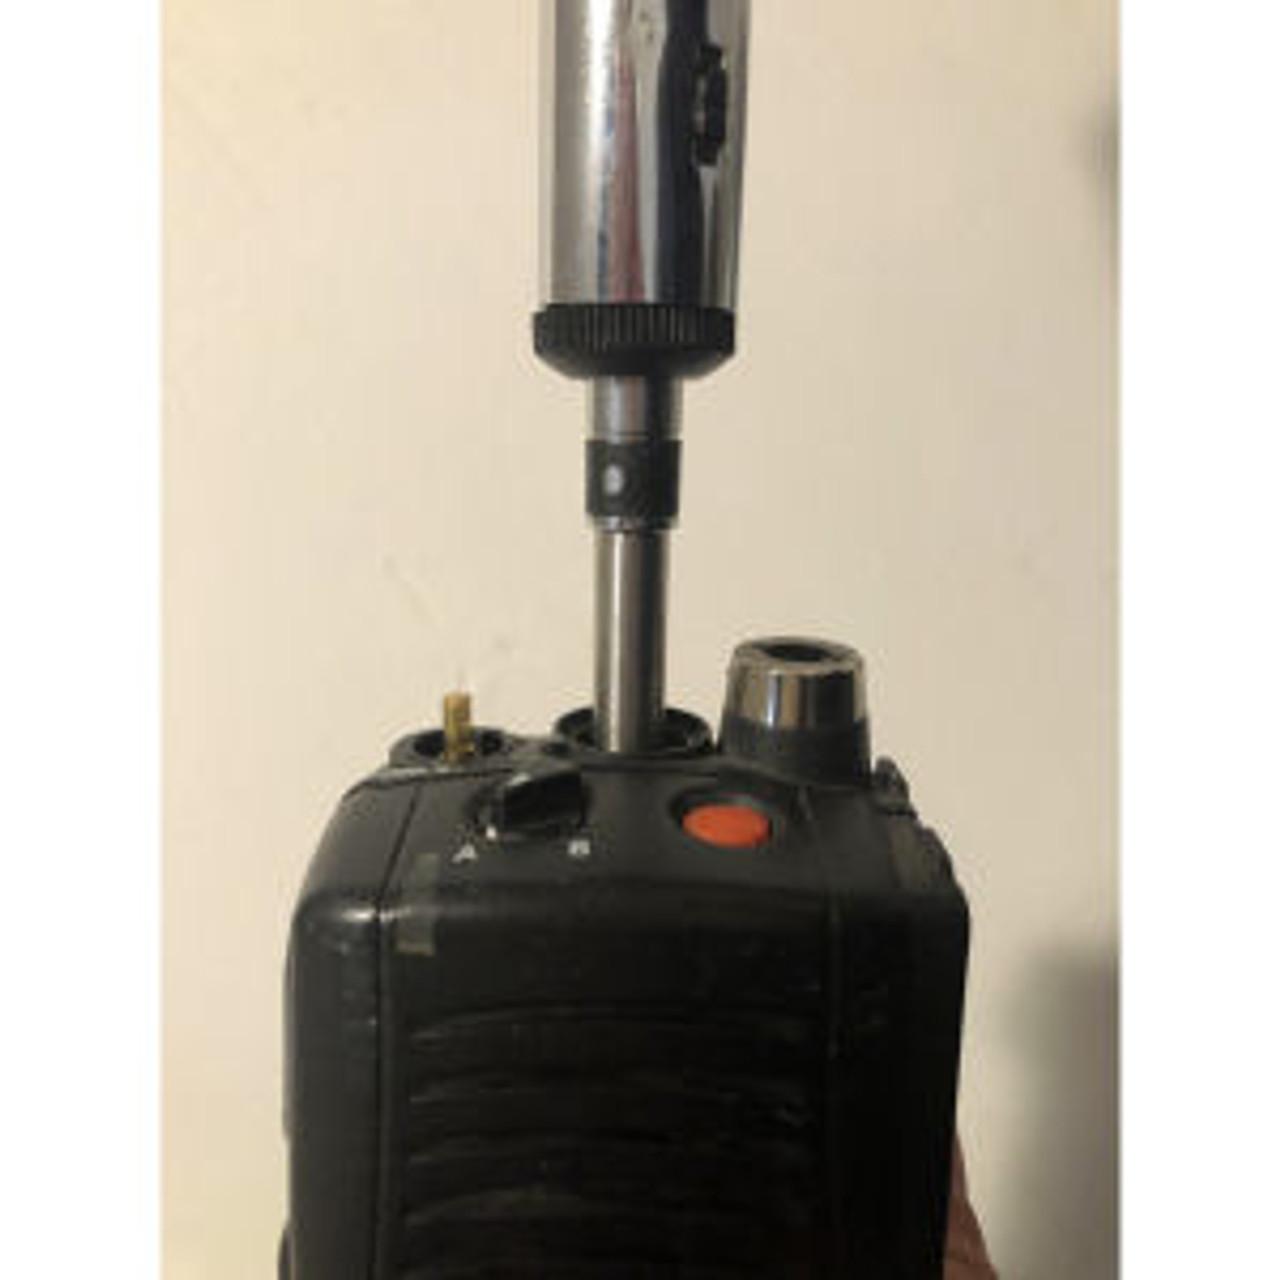 Harris XG-25P Switch Remover Tool